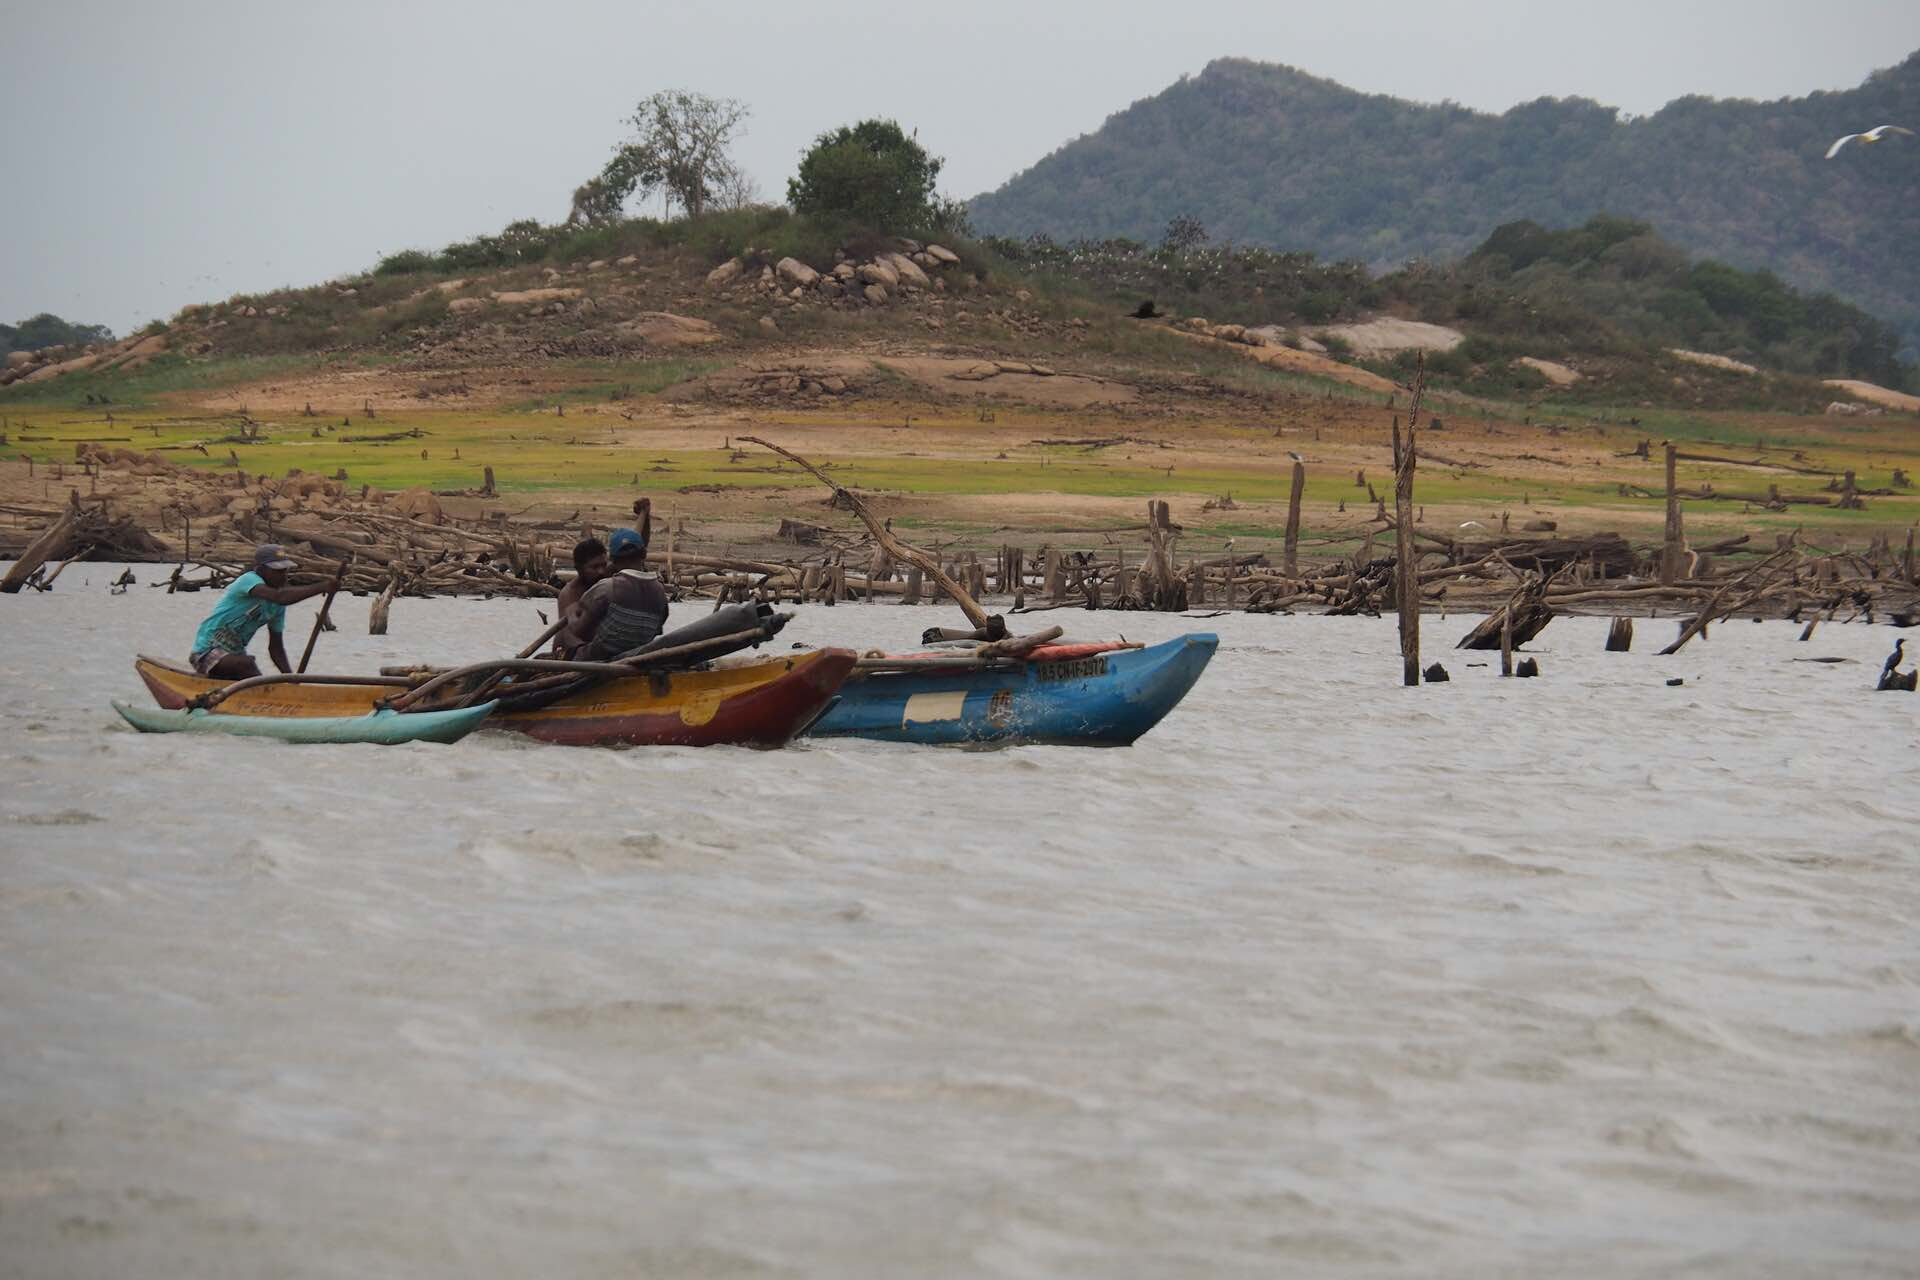 sri-lanka-gal-oya-boat-safariholiday-review-feedback-invite-to-paradise-quentin-kate-hulm.jpg